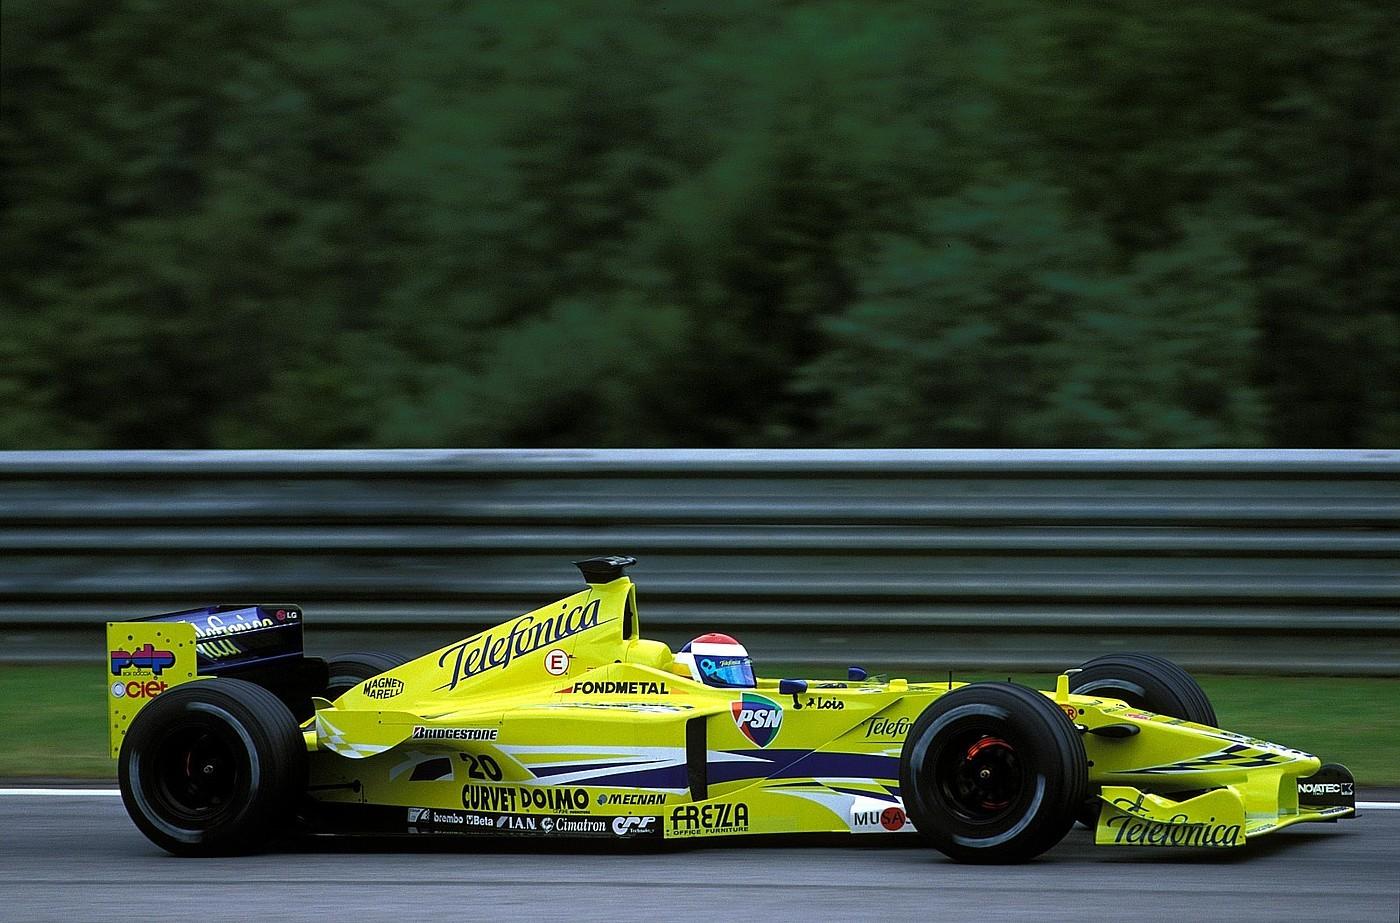 10 Austrian Grand Prix Austria A1-Ring, Spielberg minardi_m02.jpg